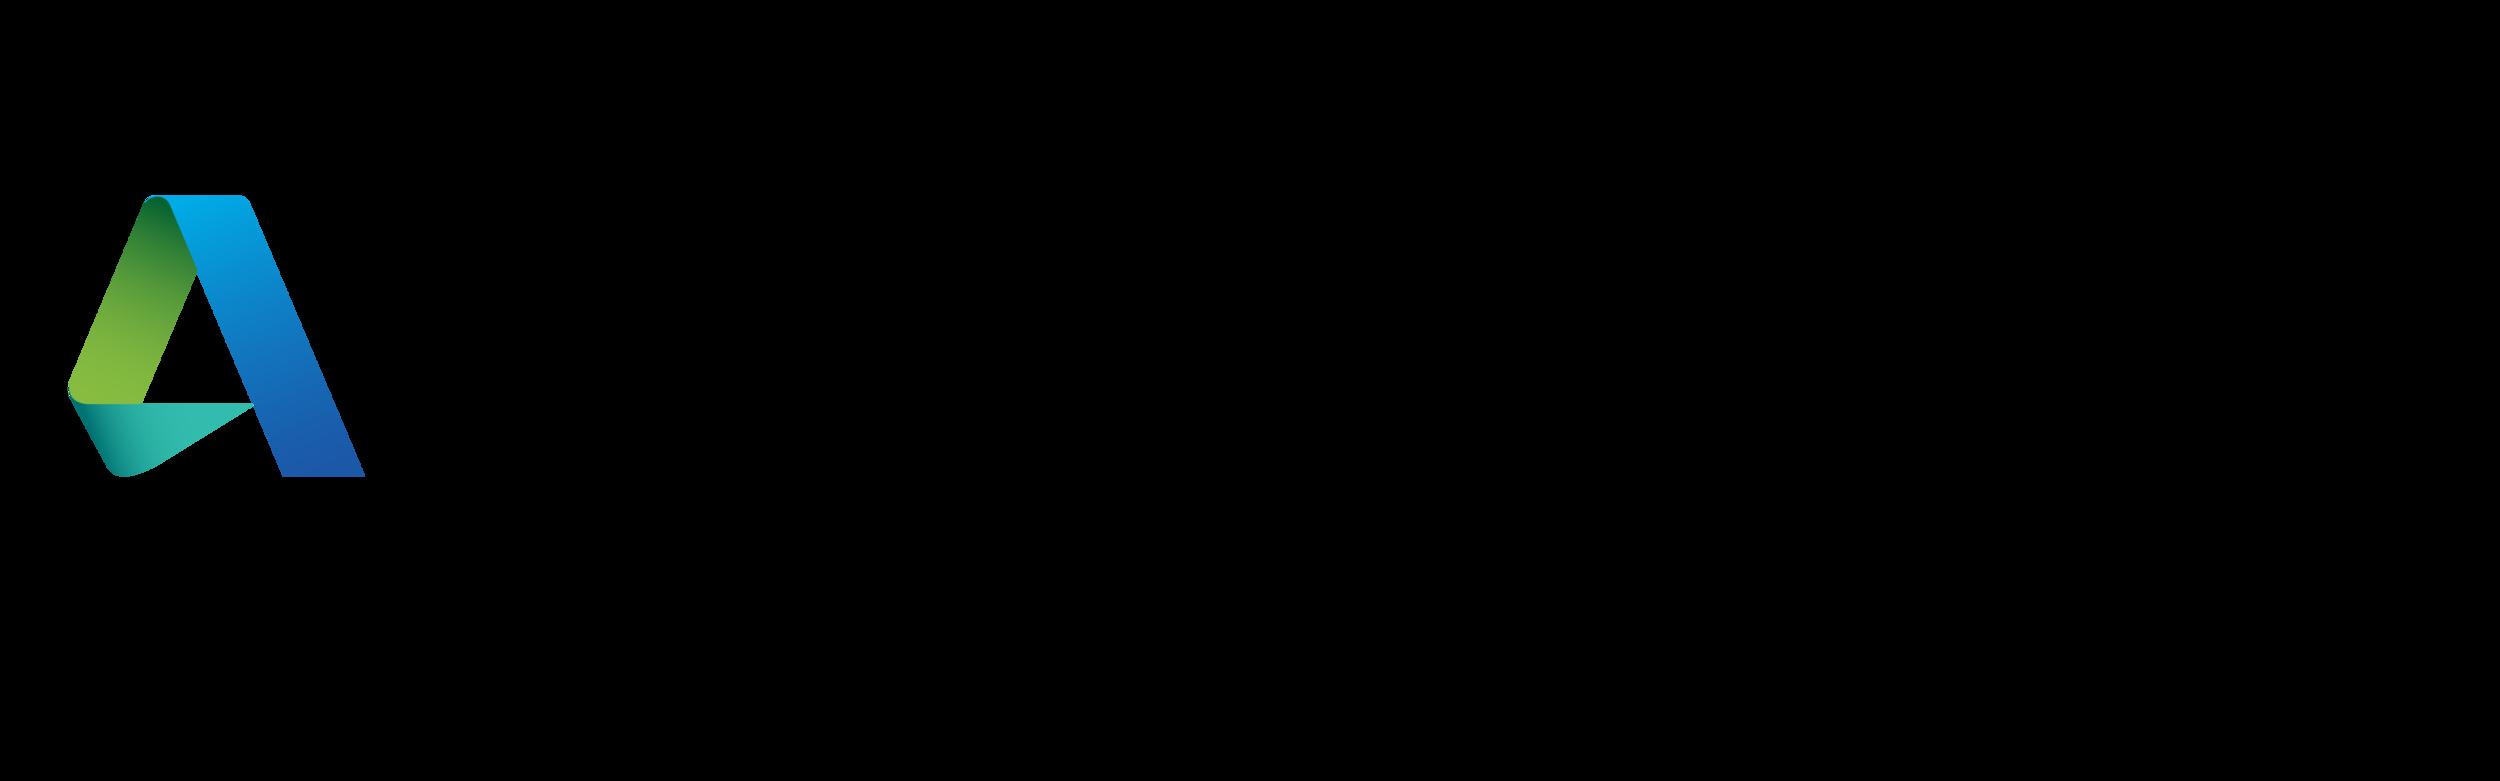 entrepreneur-impact-partner-logo-color-text-black-screen.png